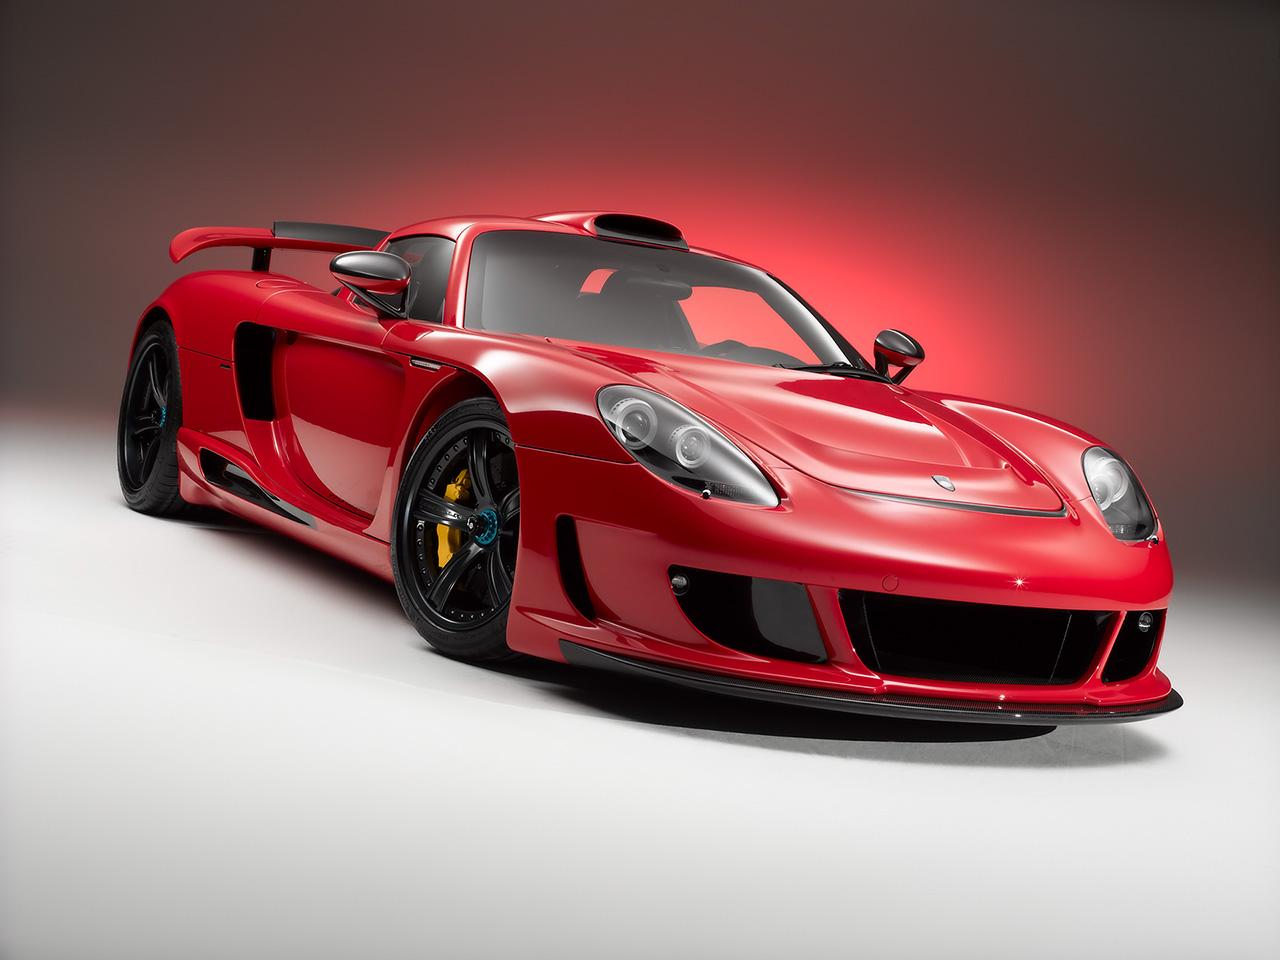 Moderate Cars: Porsche Carrera Gt Turbo